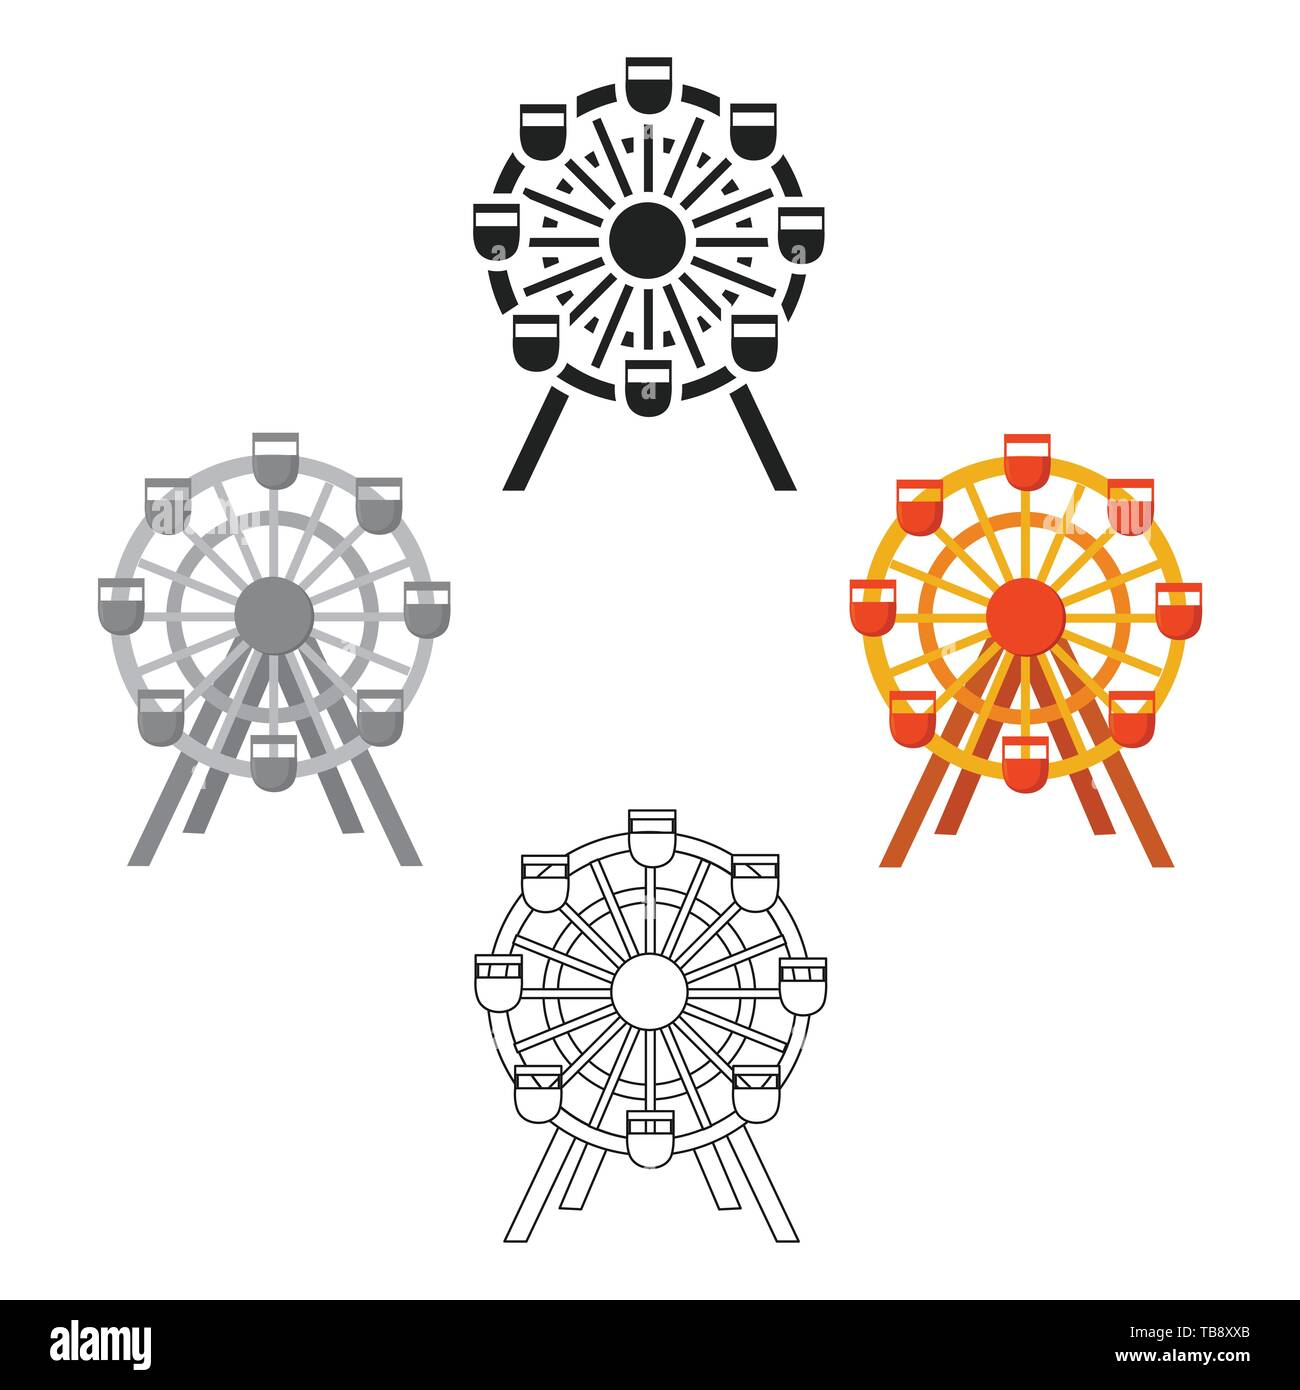 Ferris Wheel Icon Cartoon Black Single Building Icon From The Big City Infrastructure Cartoon Stock Vector Image Art Alamy